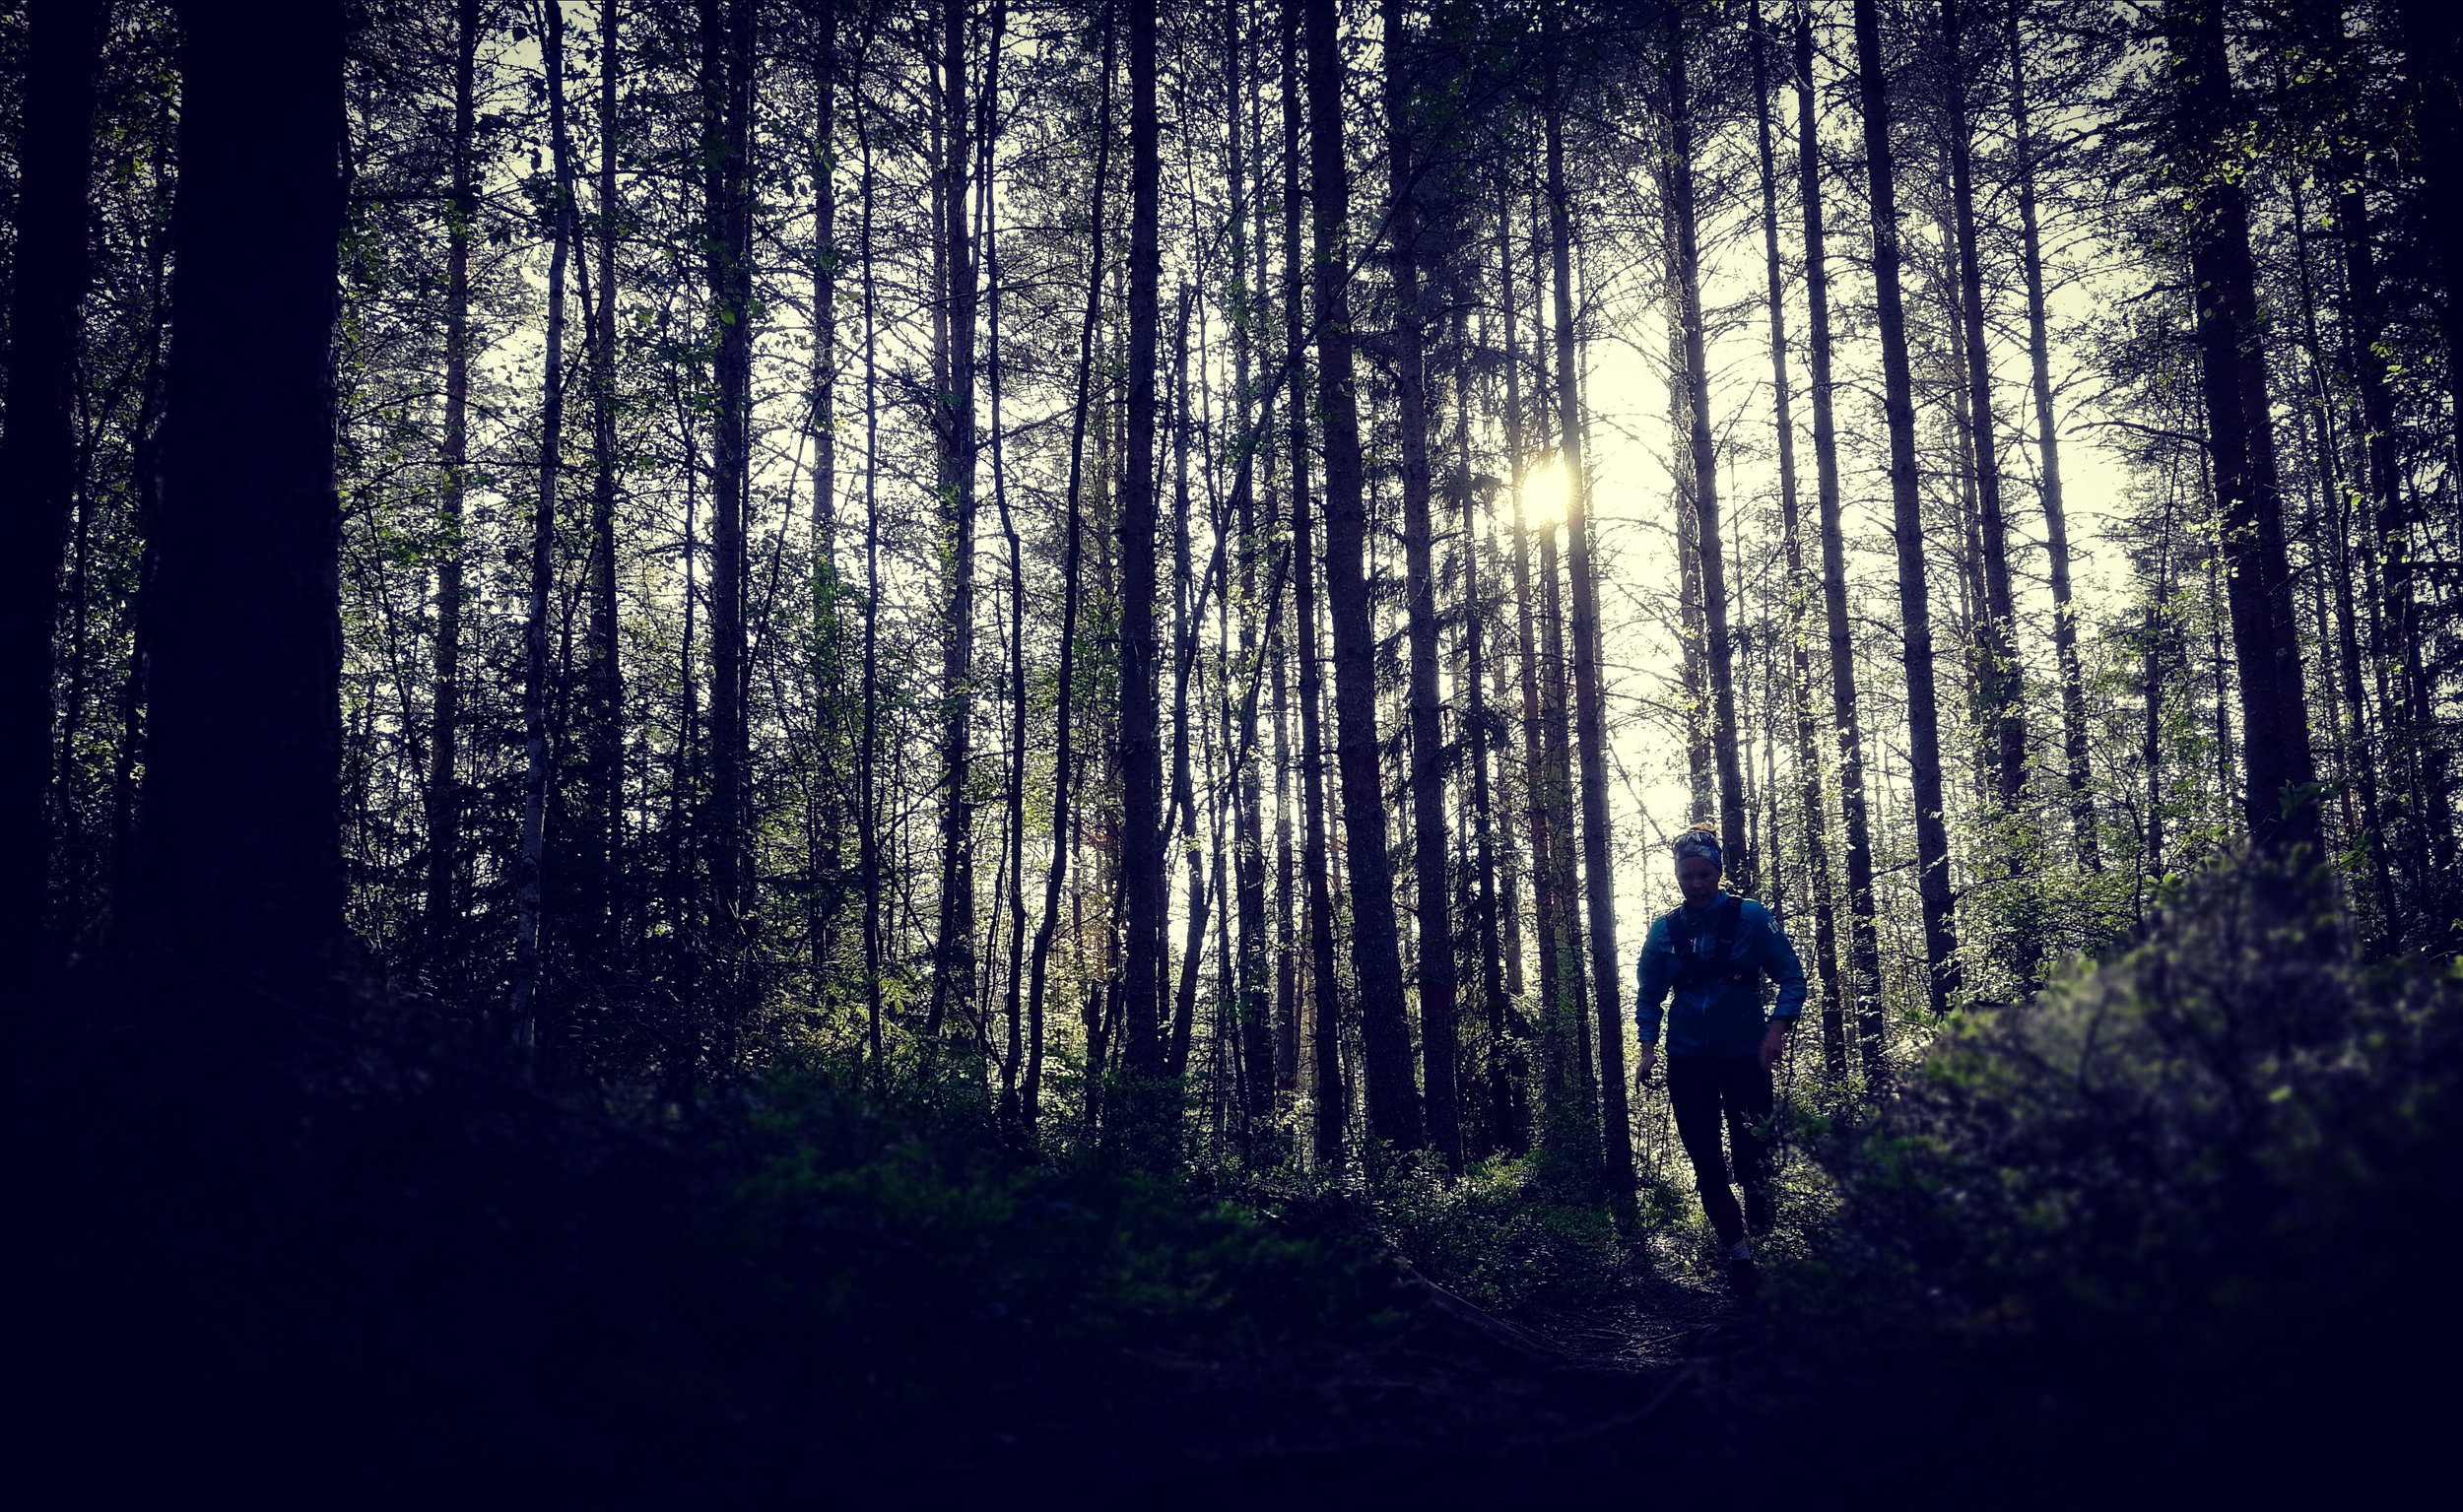 Balanserat-trail-running-02.jpg